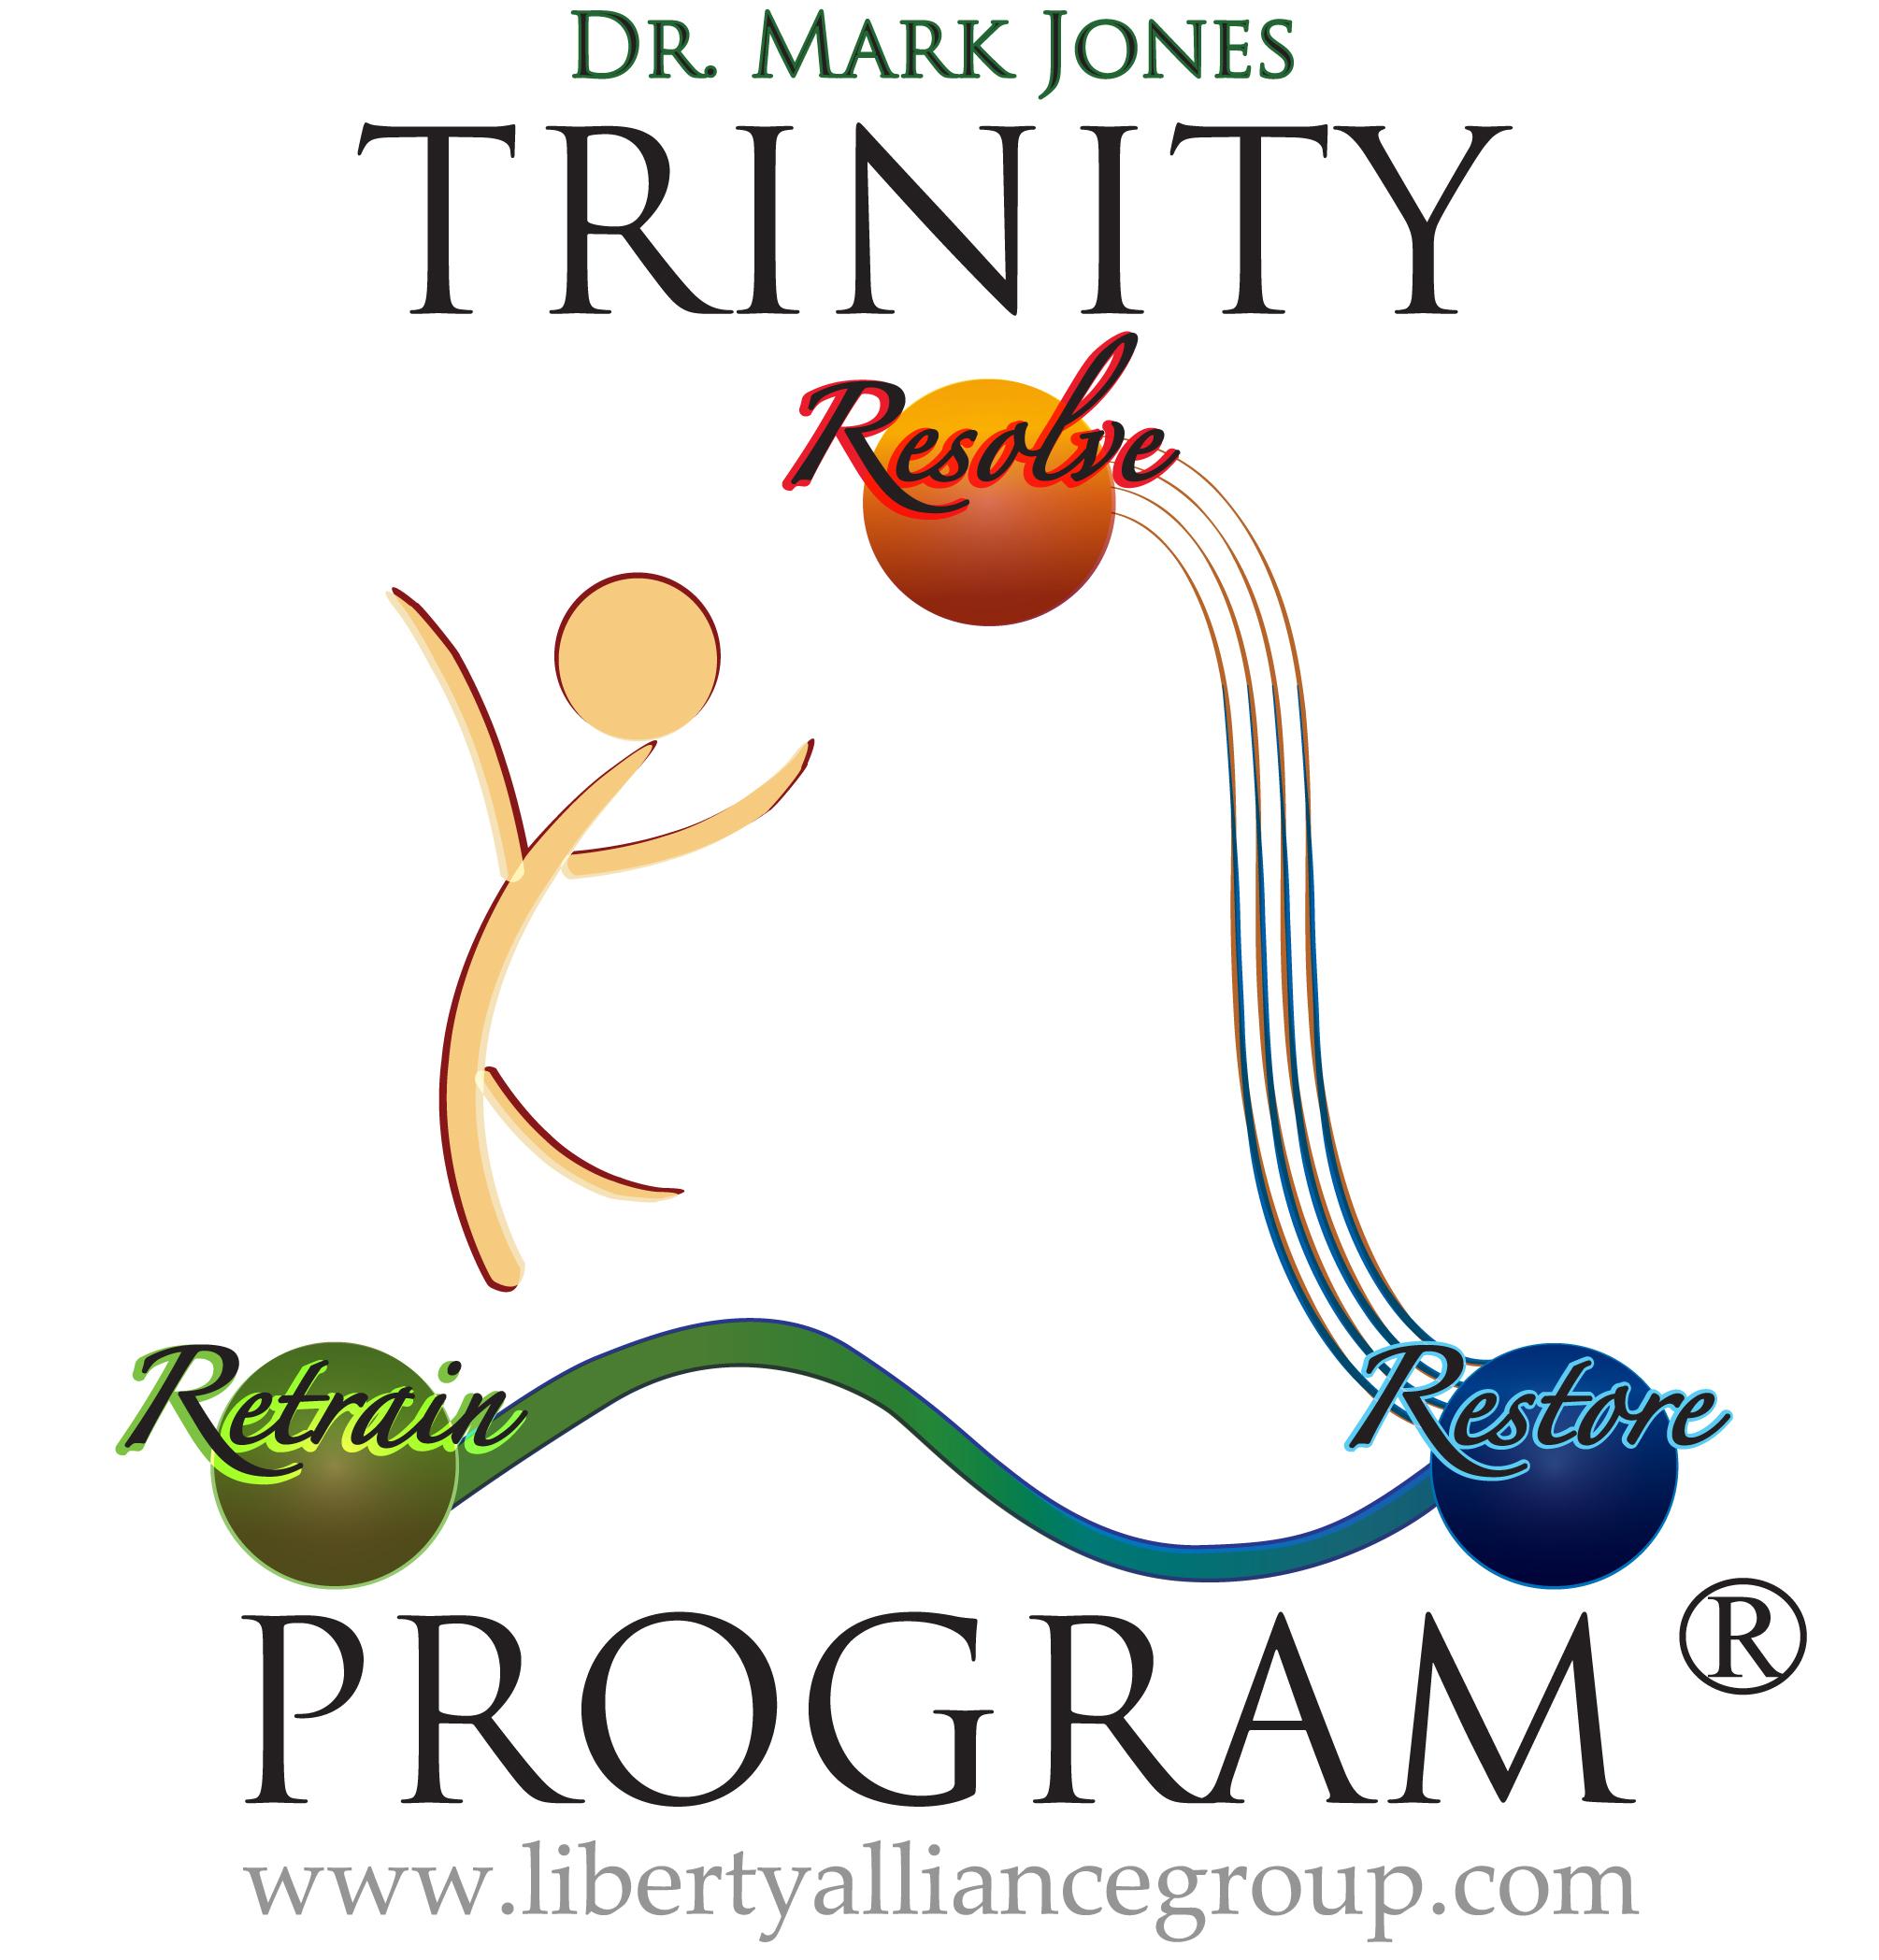 TRINITY PROGRAM LOGO